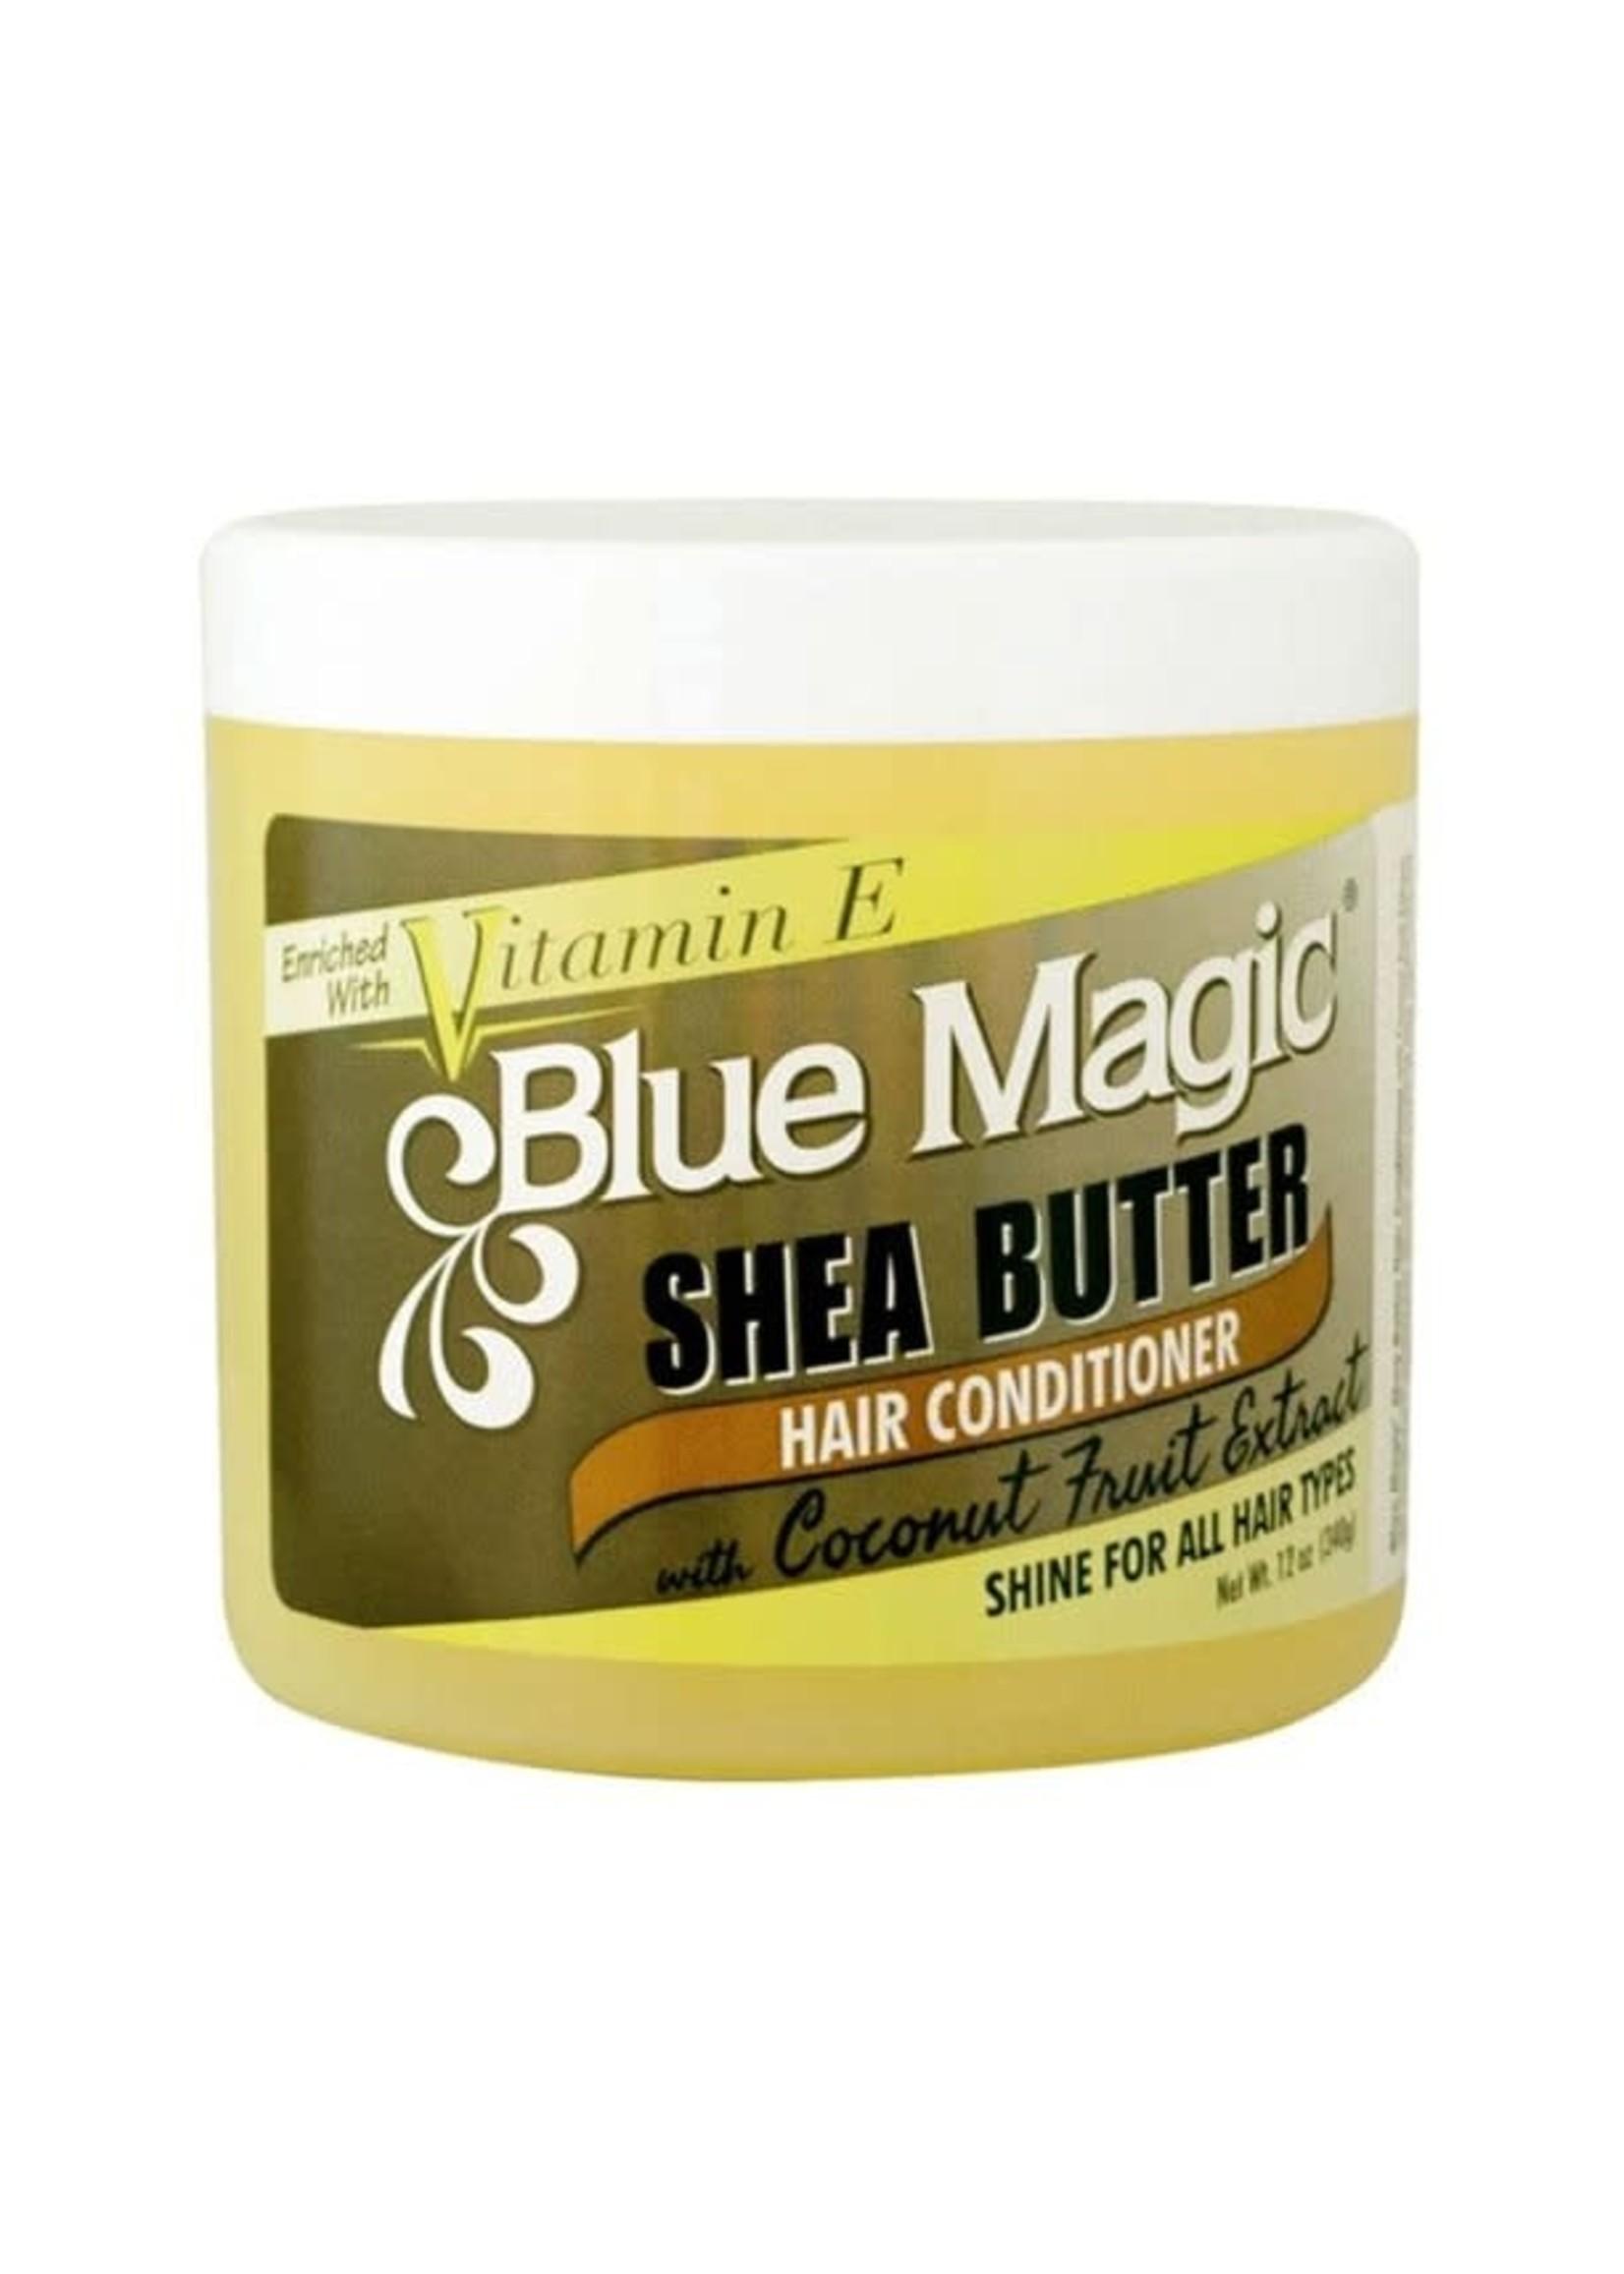 Blue Magic Shea Butter Hair Conditioner